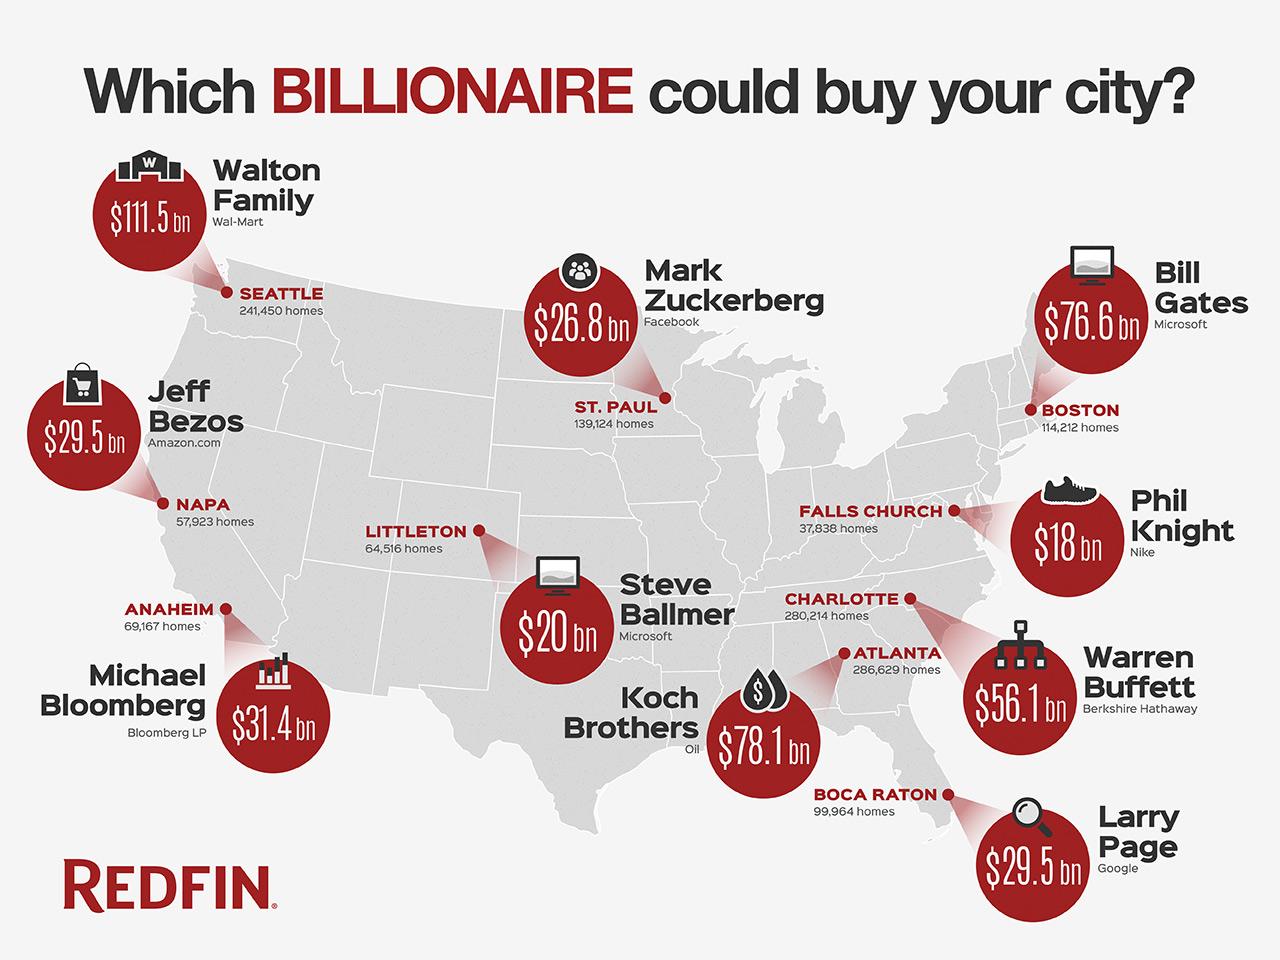 Billionaires-map-2014-06-04-final